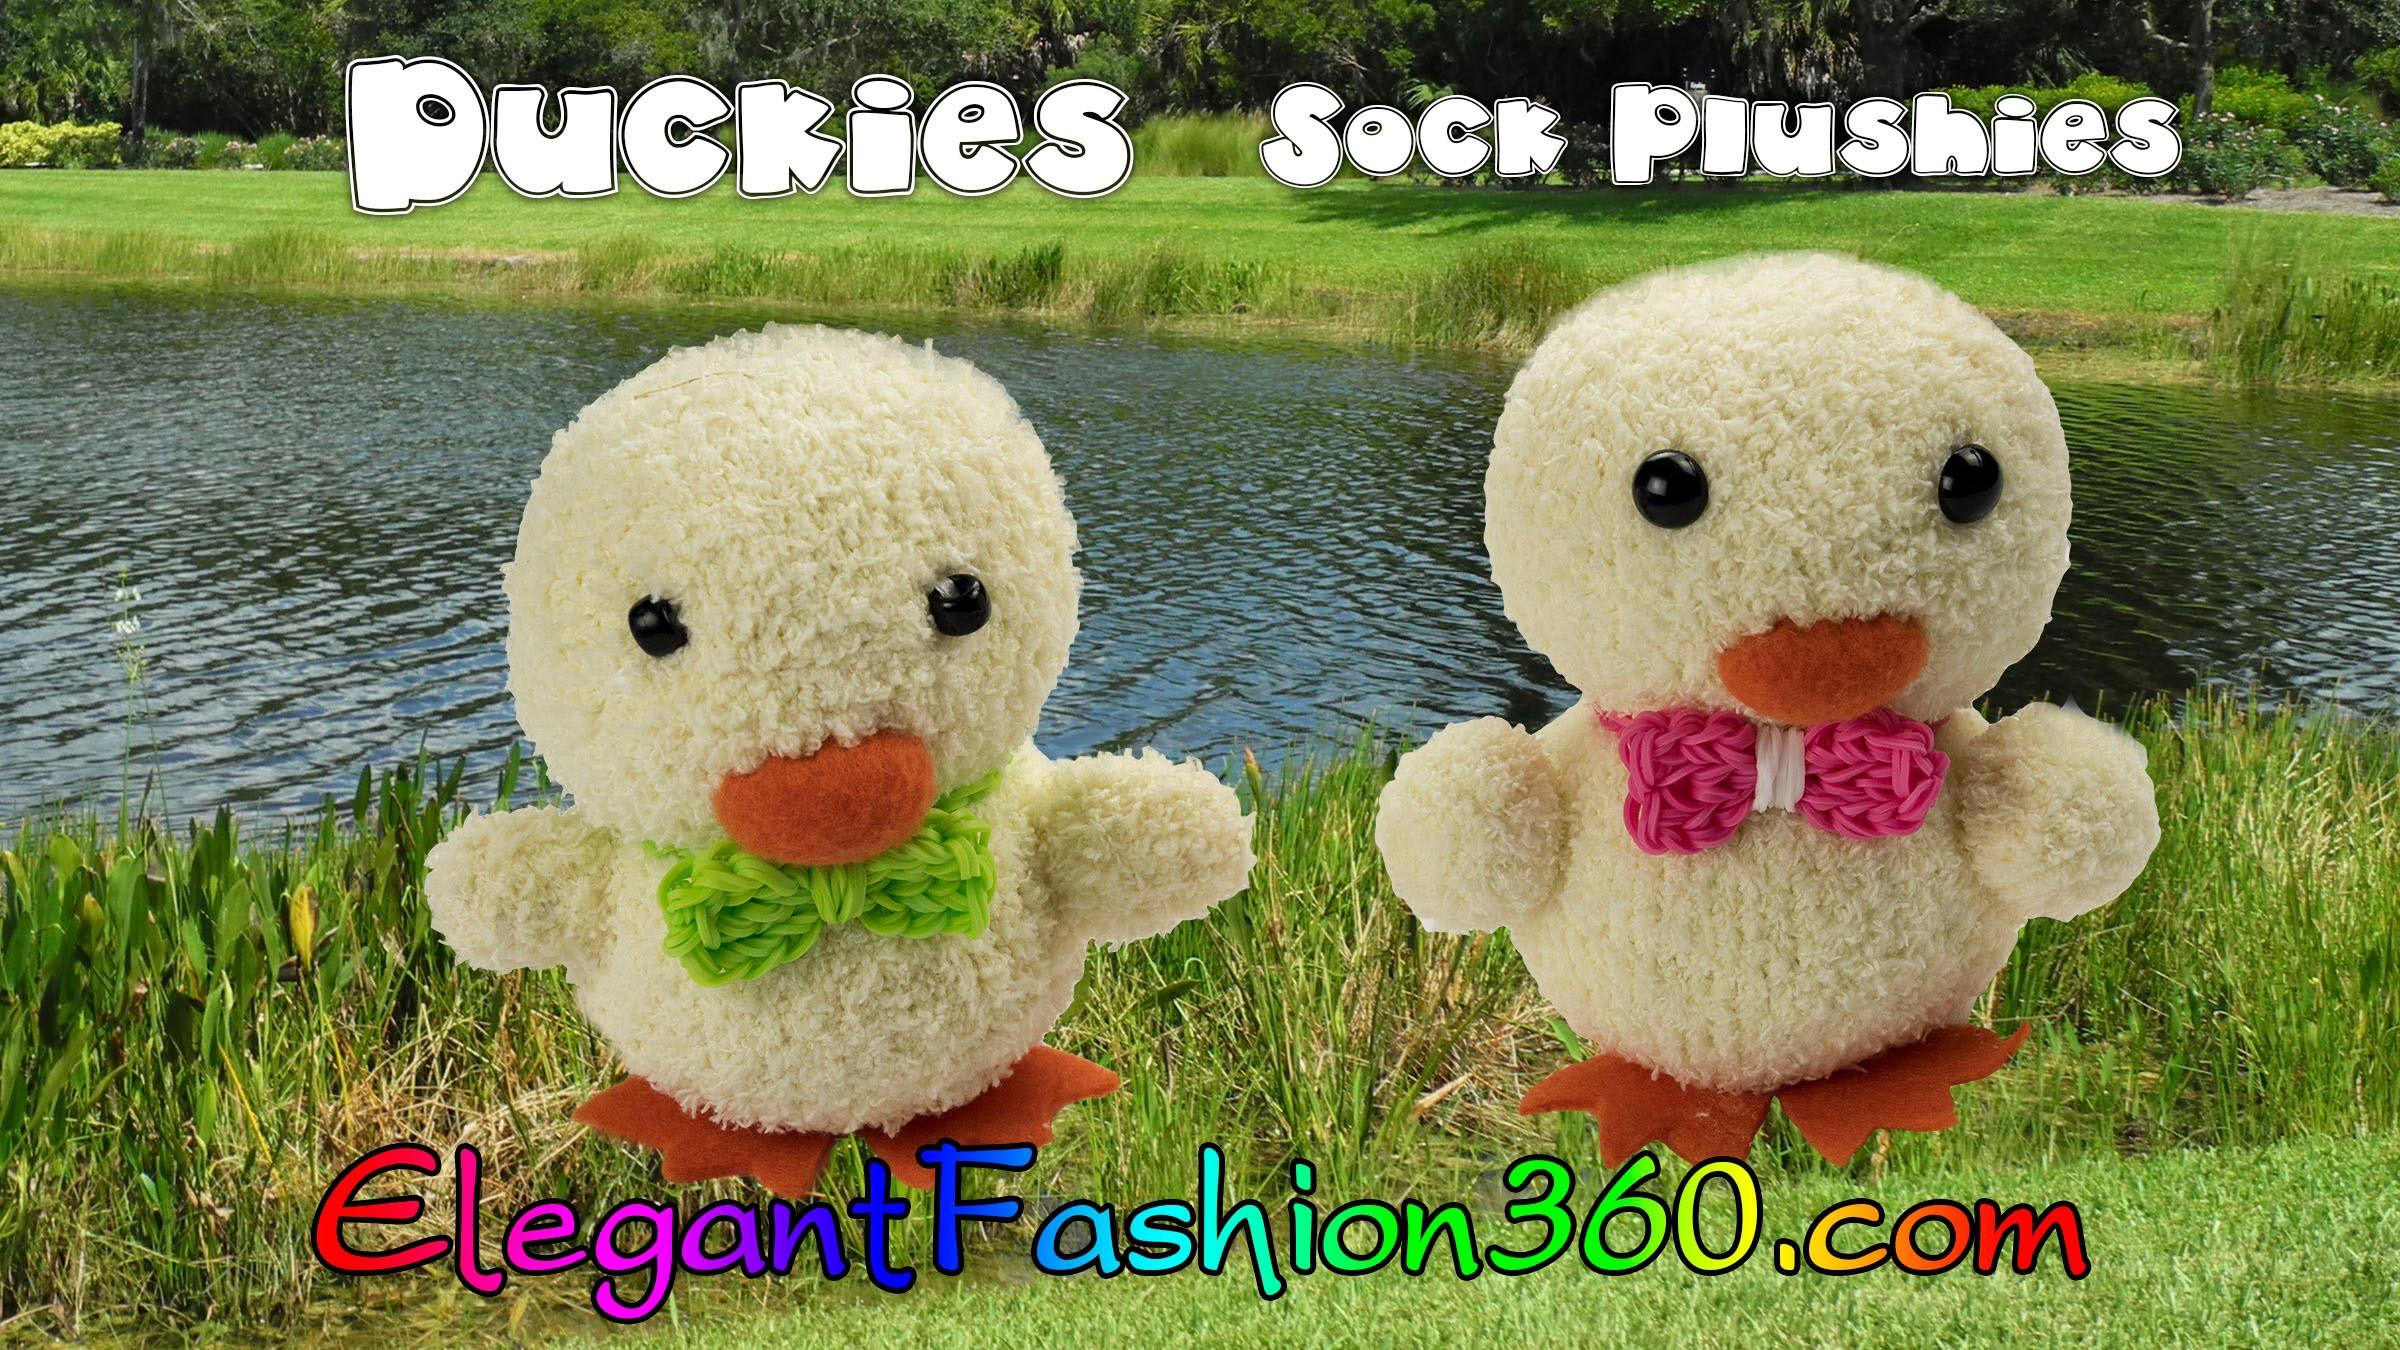 DIY Kawaii Ducky.Chick Sock Plushie.Sock Stuffed Animal.Easter - How to by Elegant Fashion 360